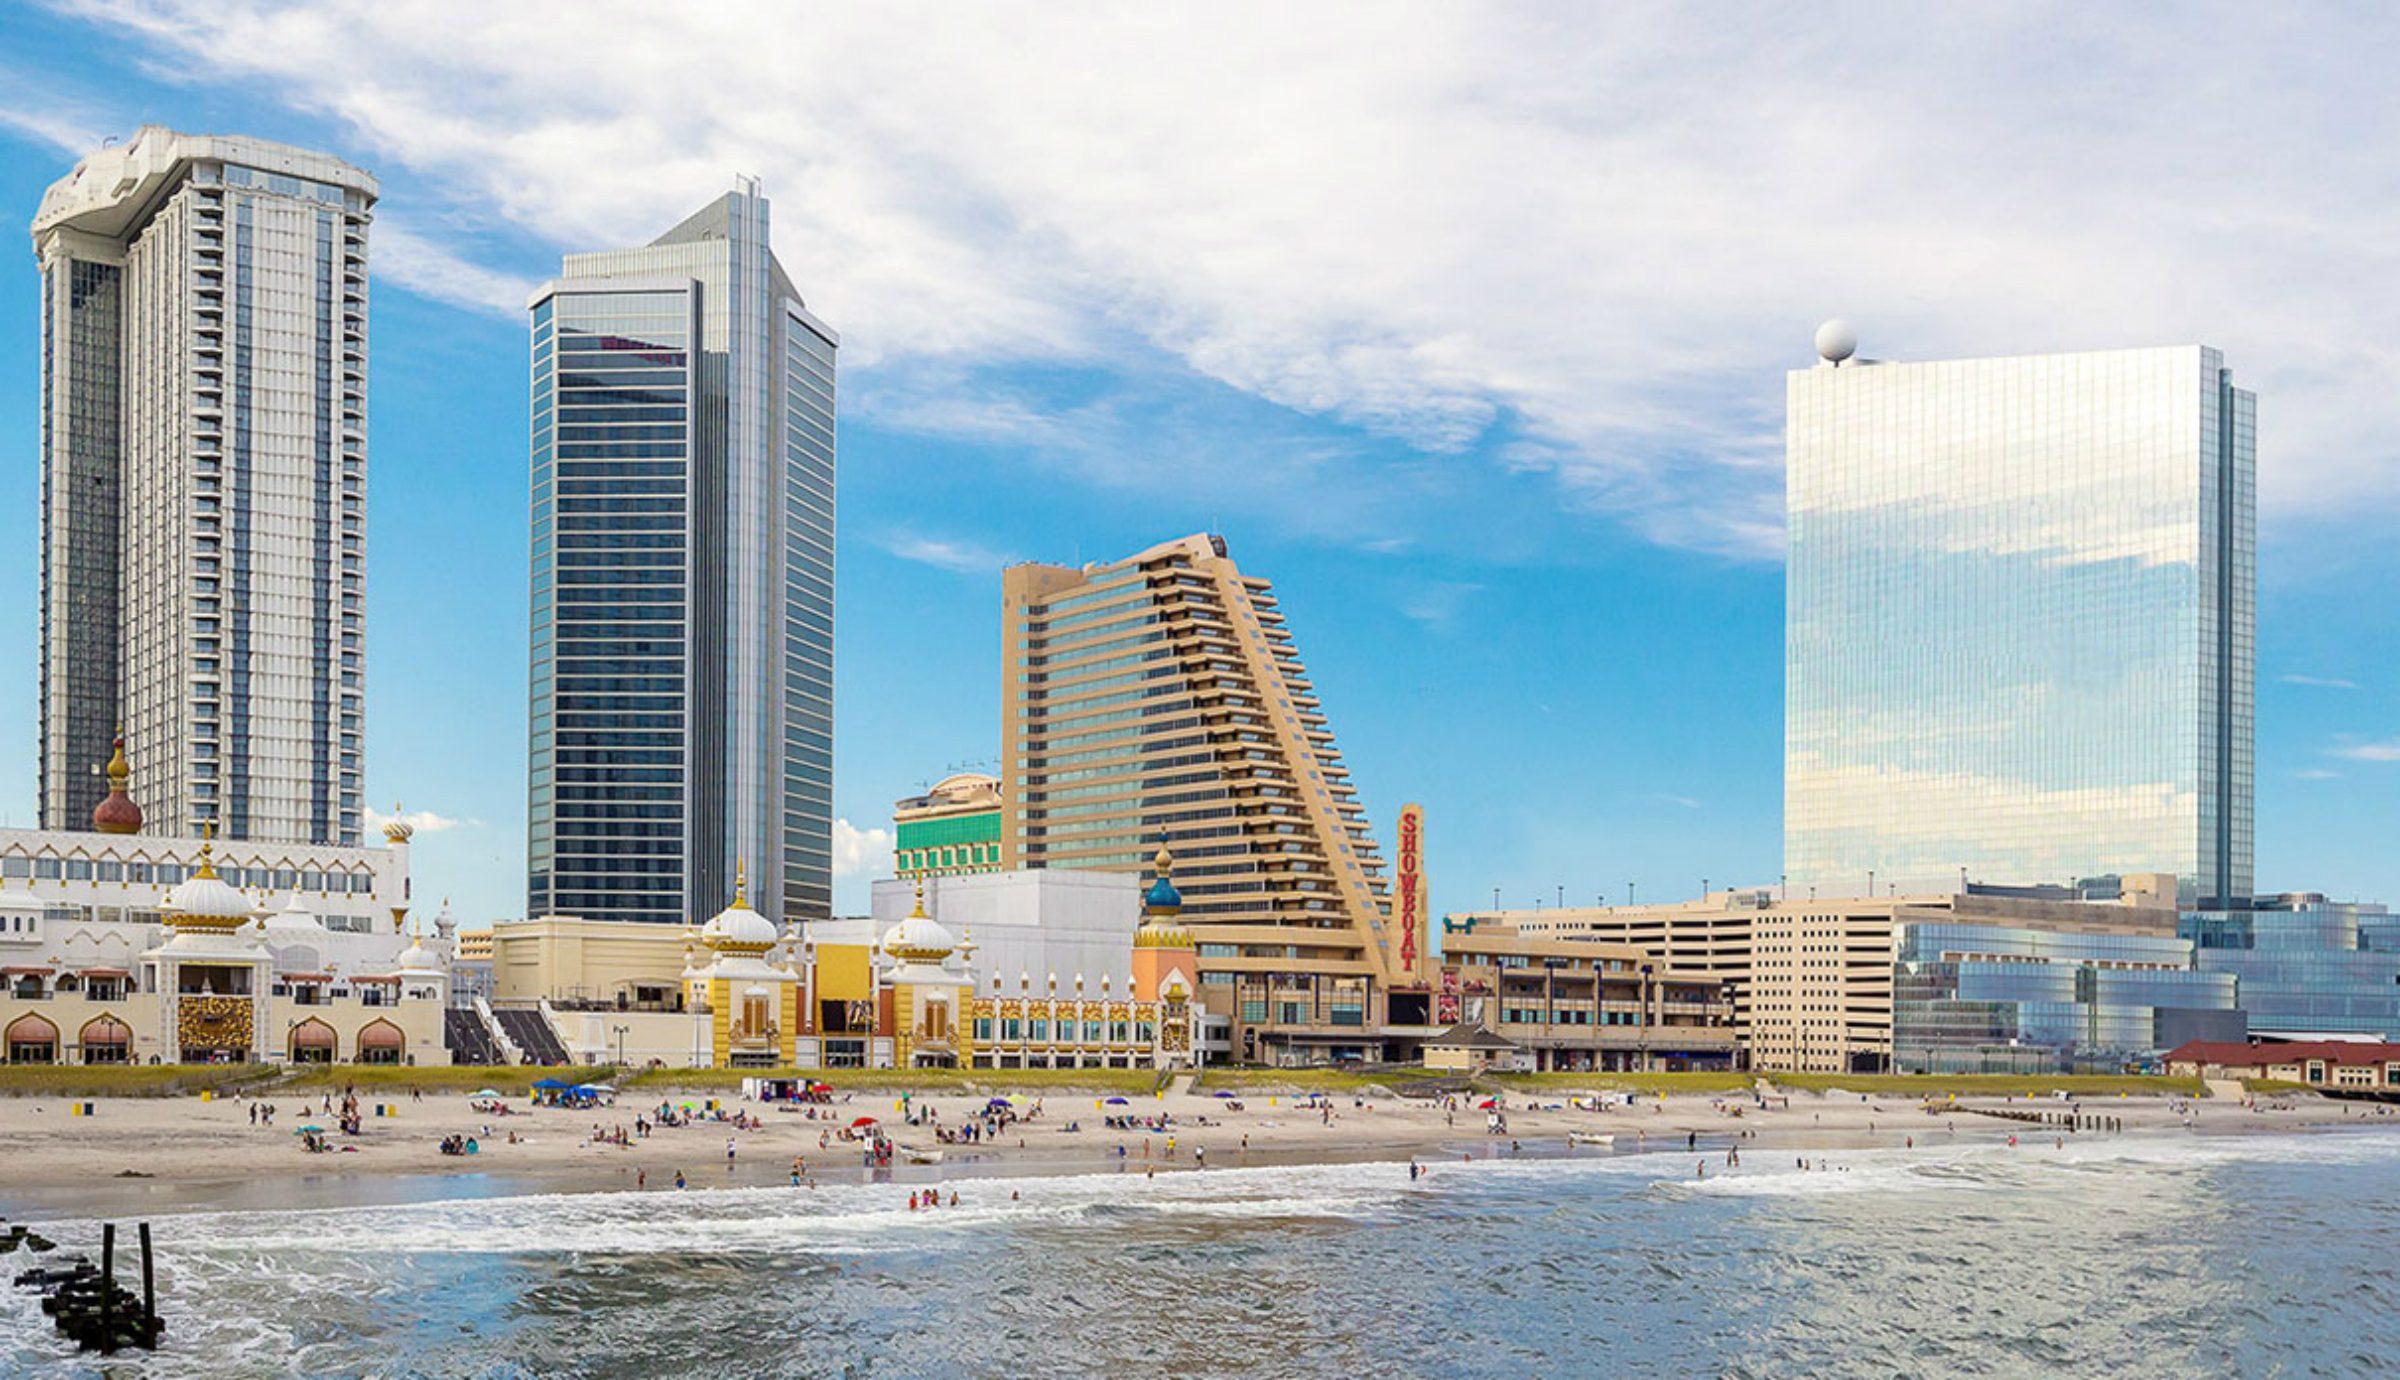 Showboat Atlantic City casino hotel